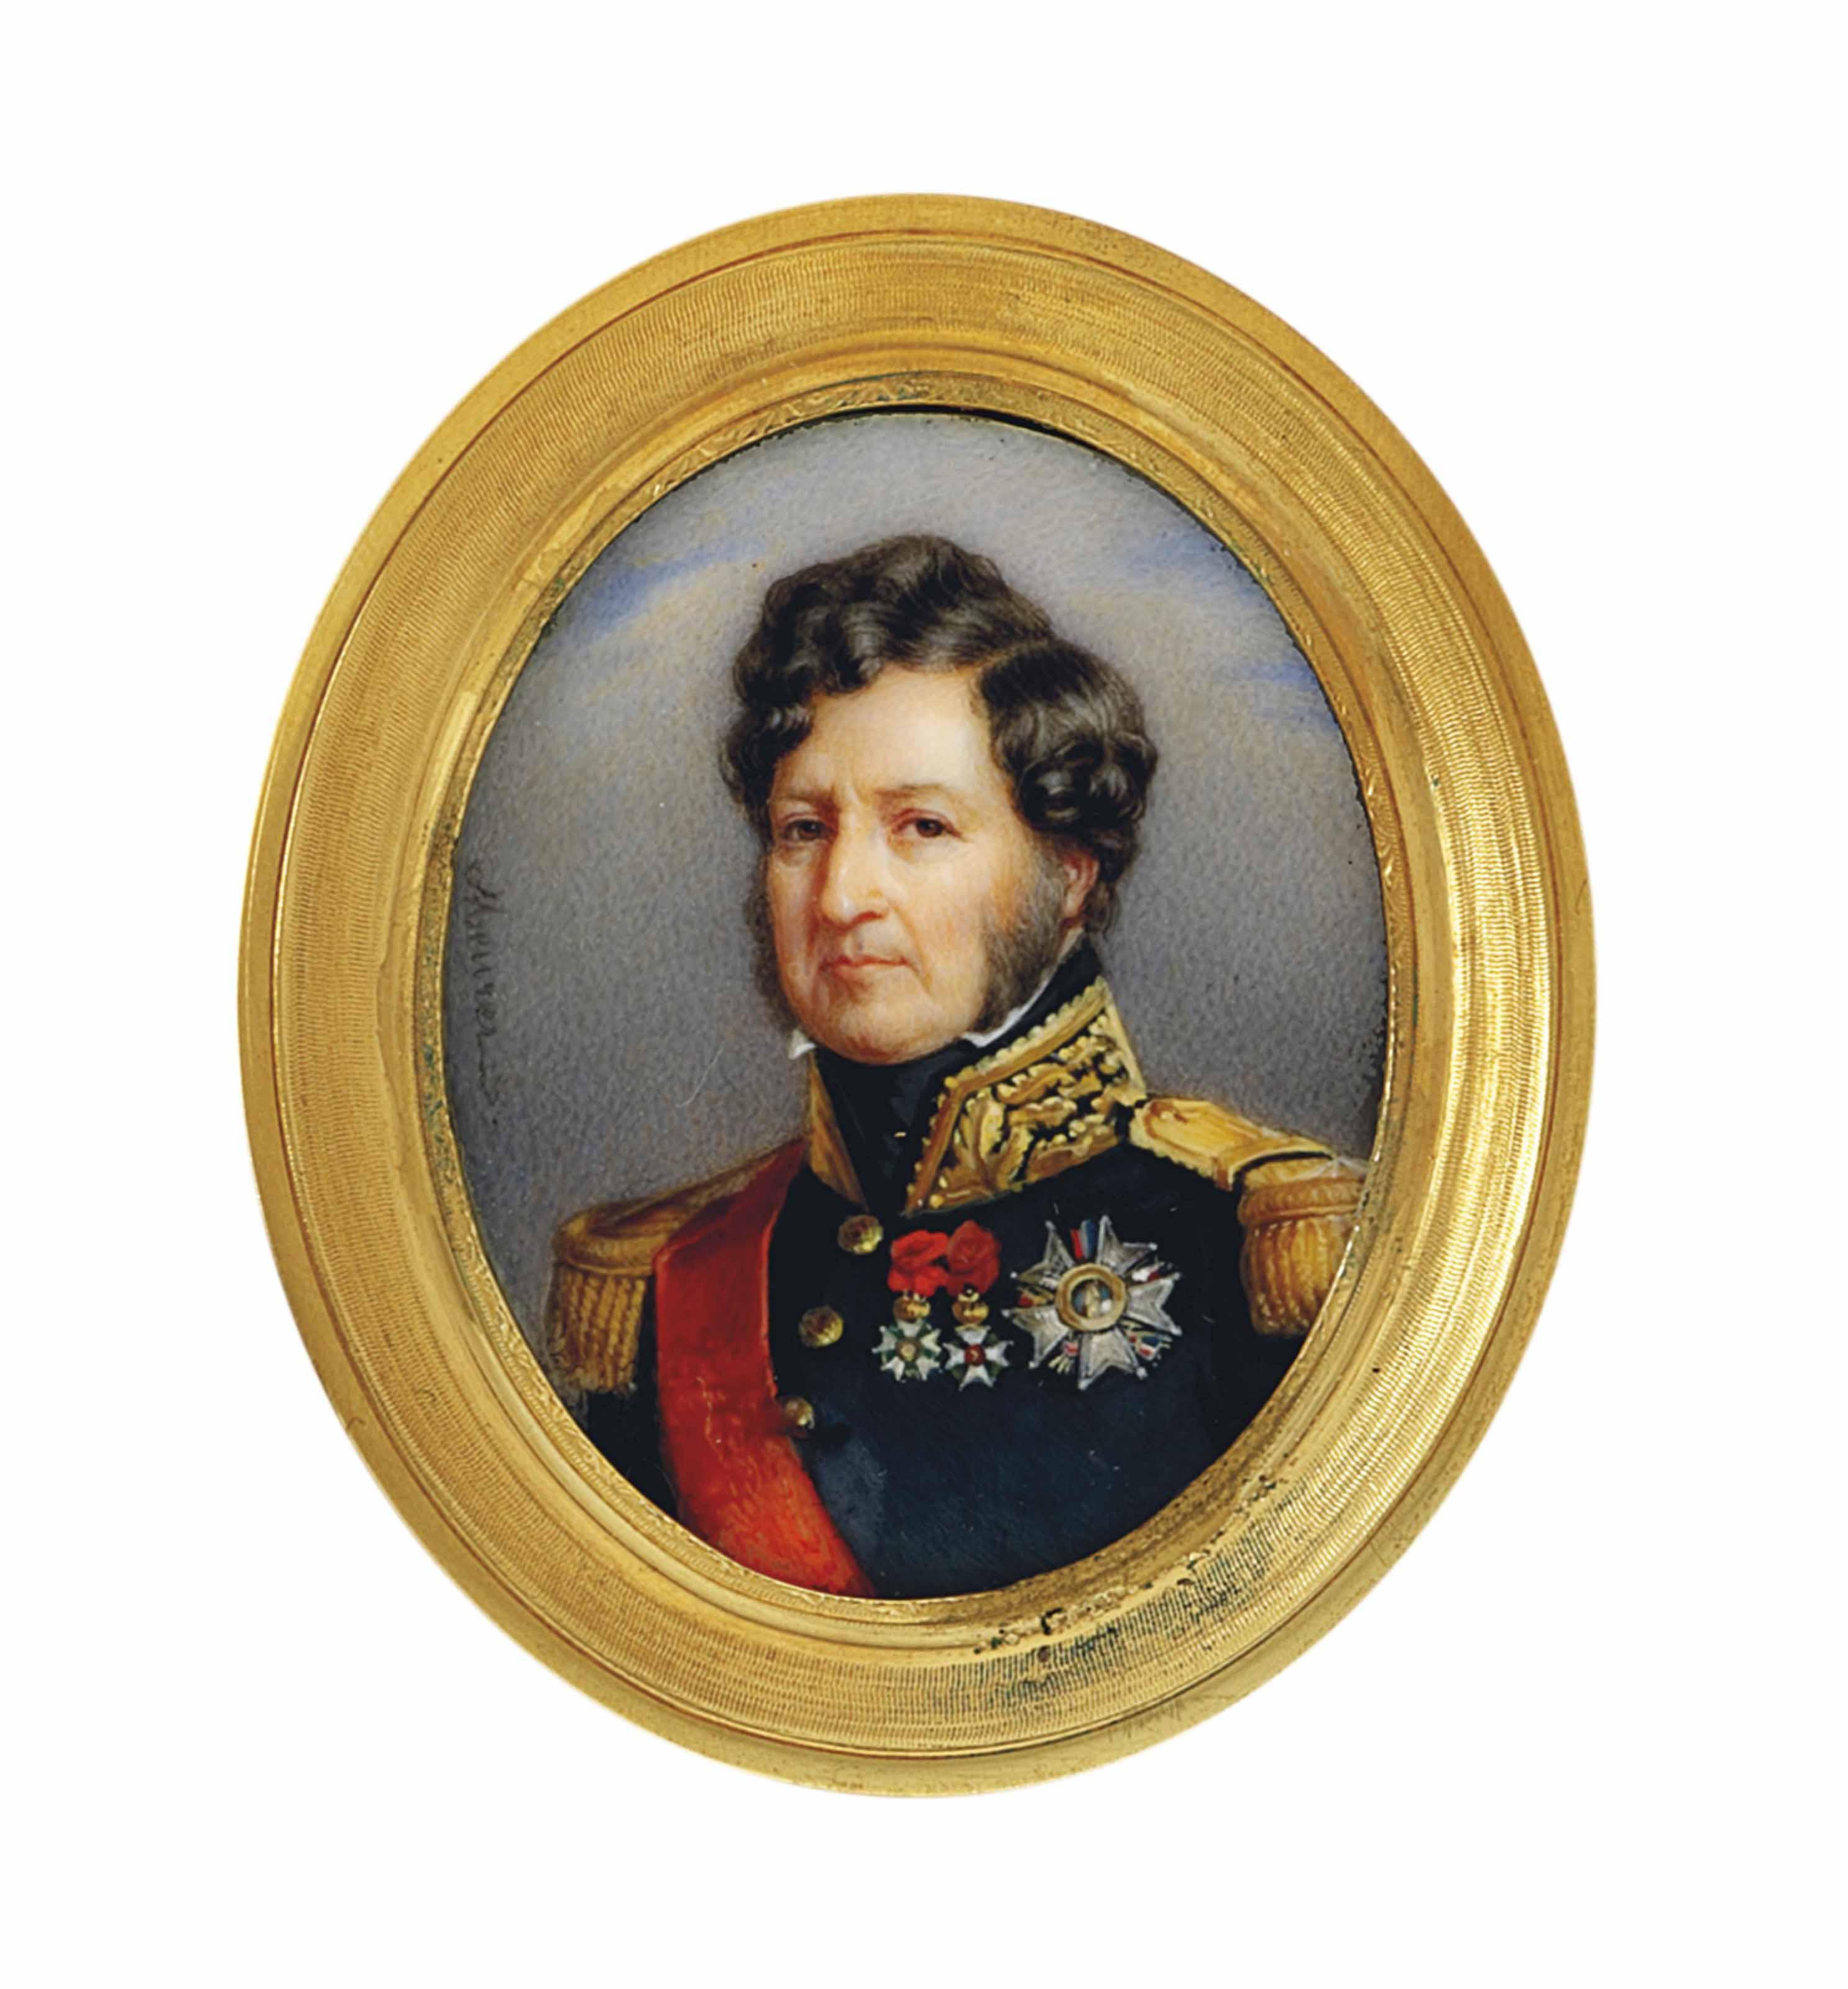 FRANÇOIS MEURET (FRENCH, 1800-1887)